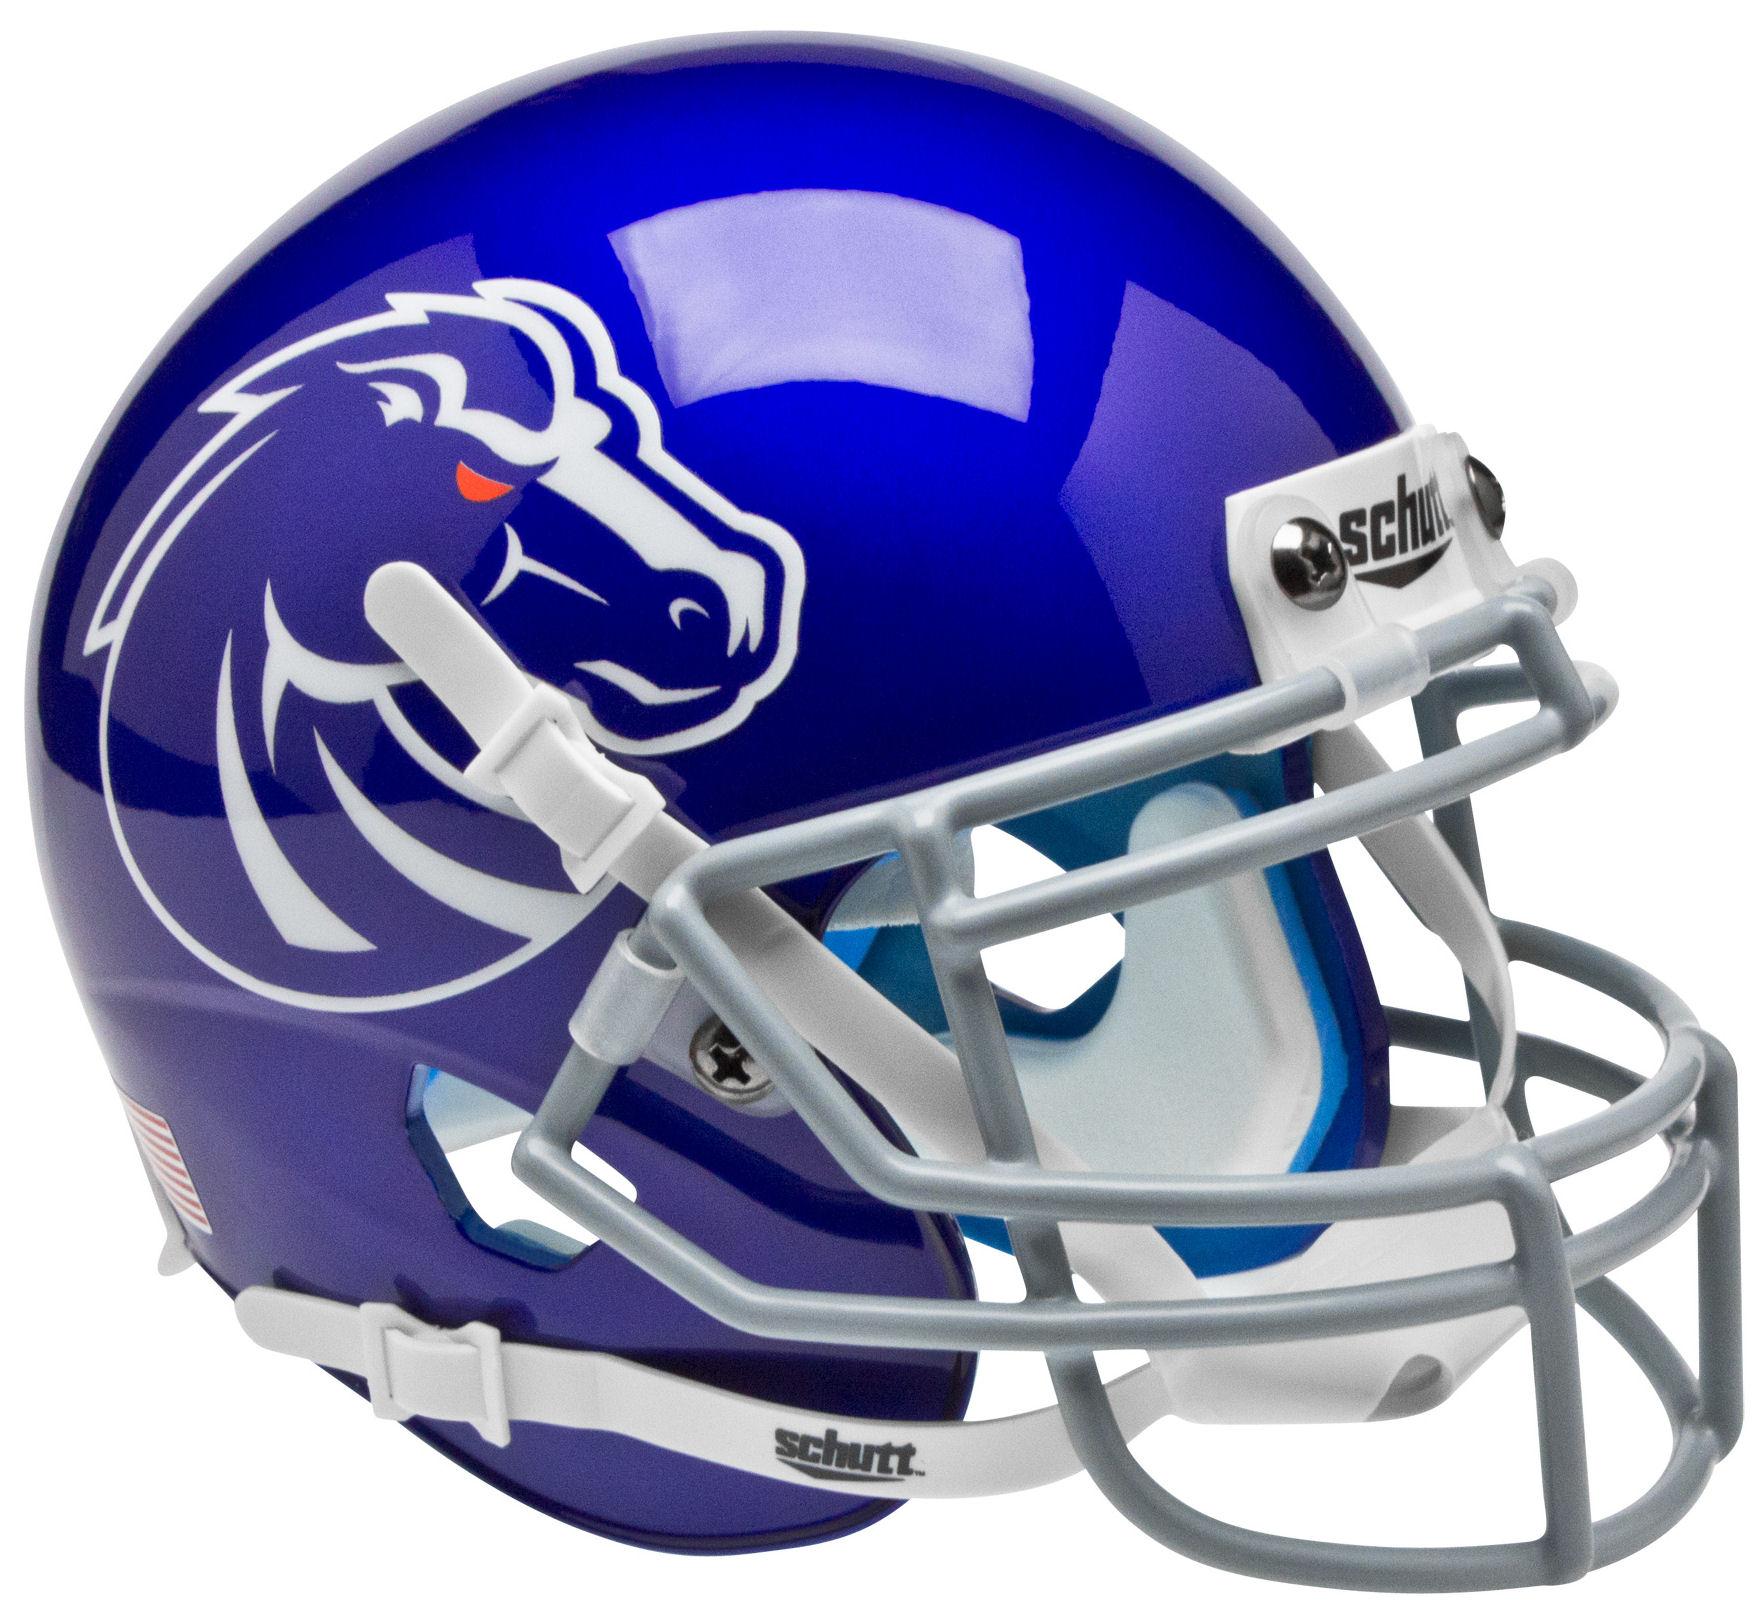 Boise State Broncos Mini Xp Authentic Helmet Schutt Mini Football Helmet Football Helmets Mini Footballs